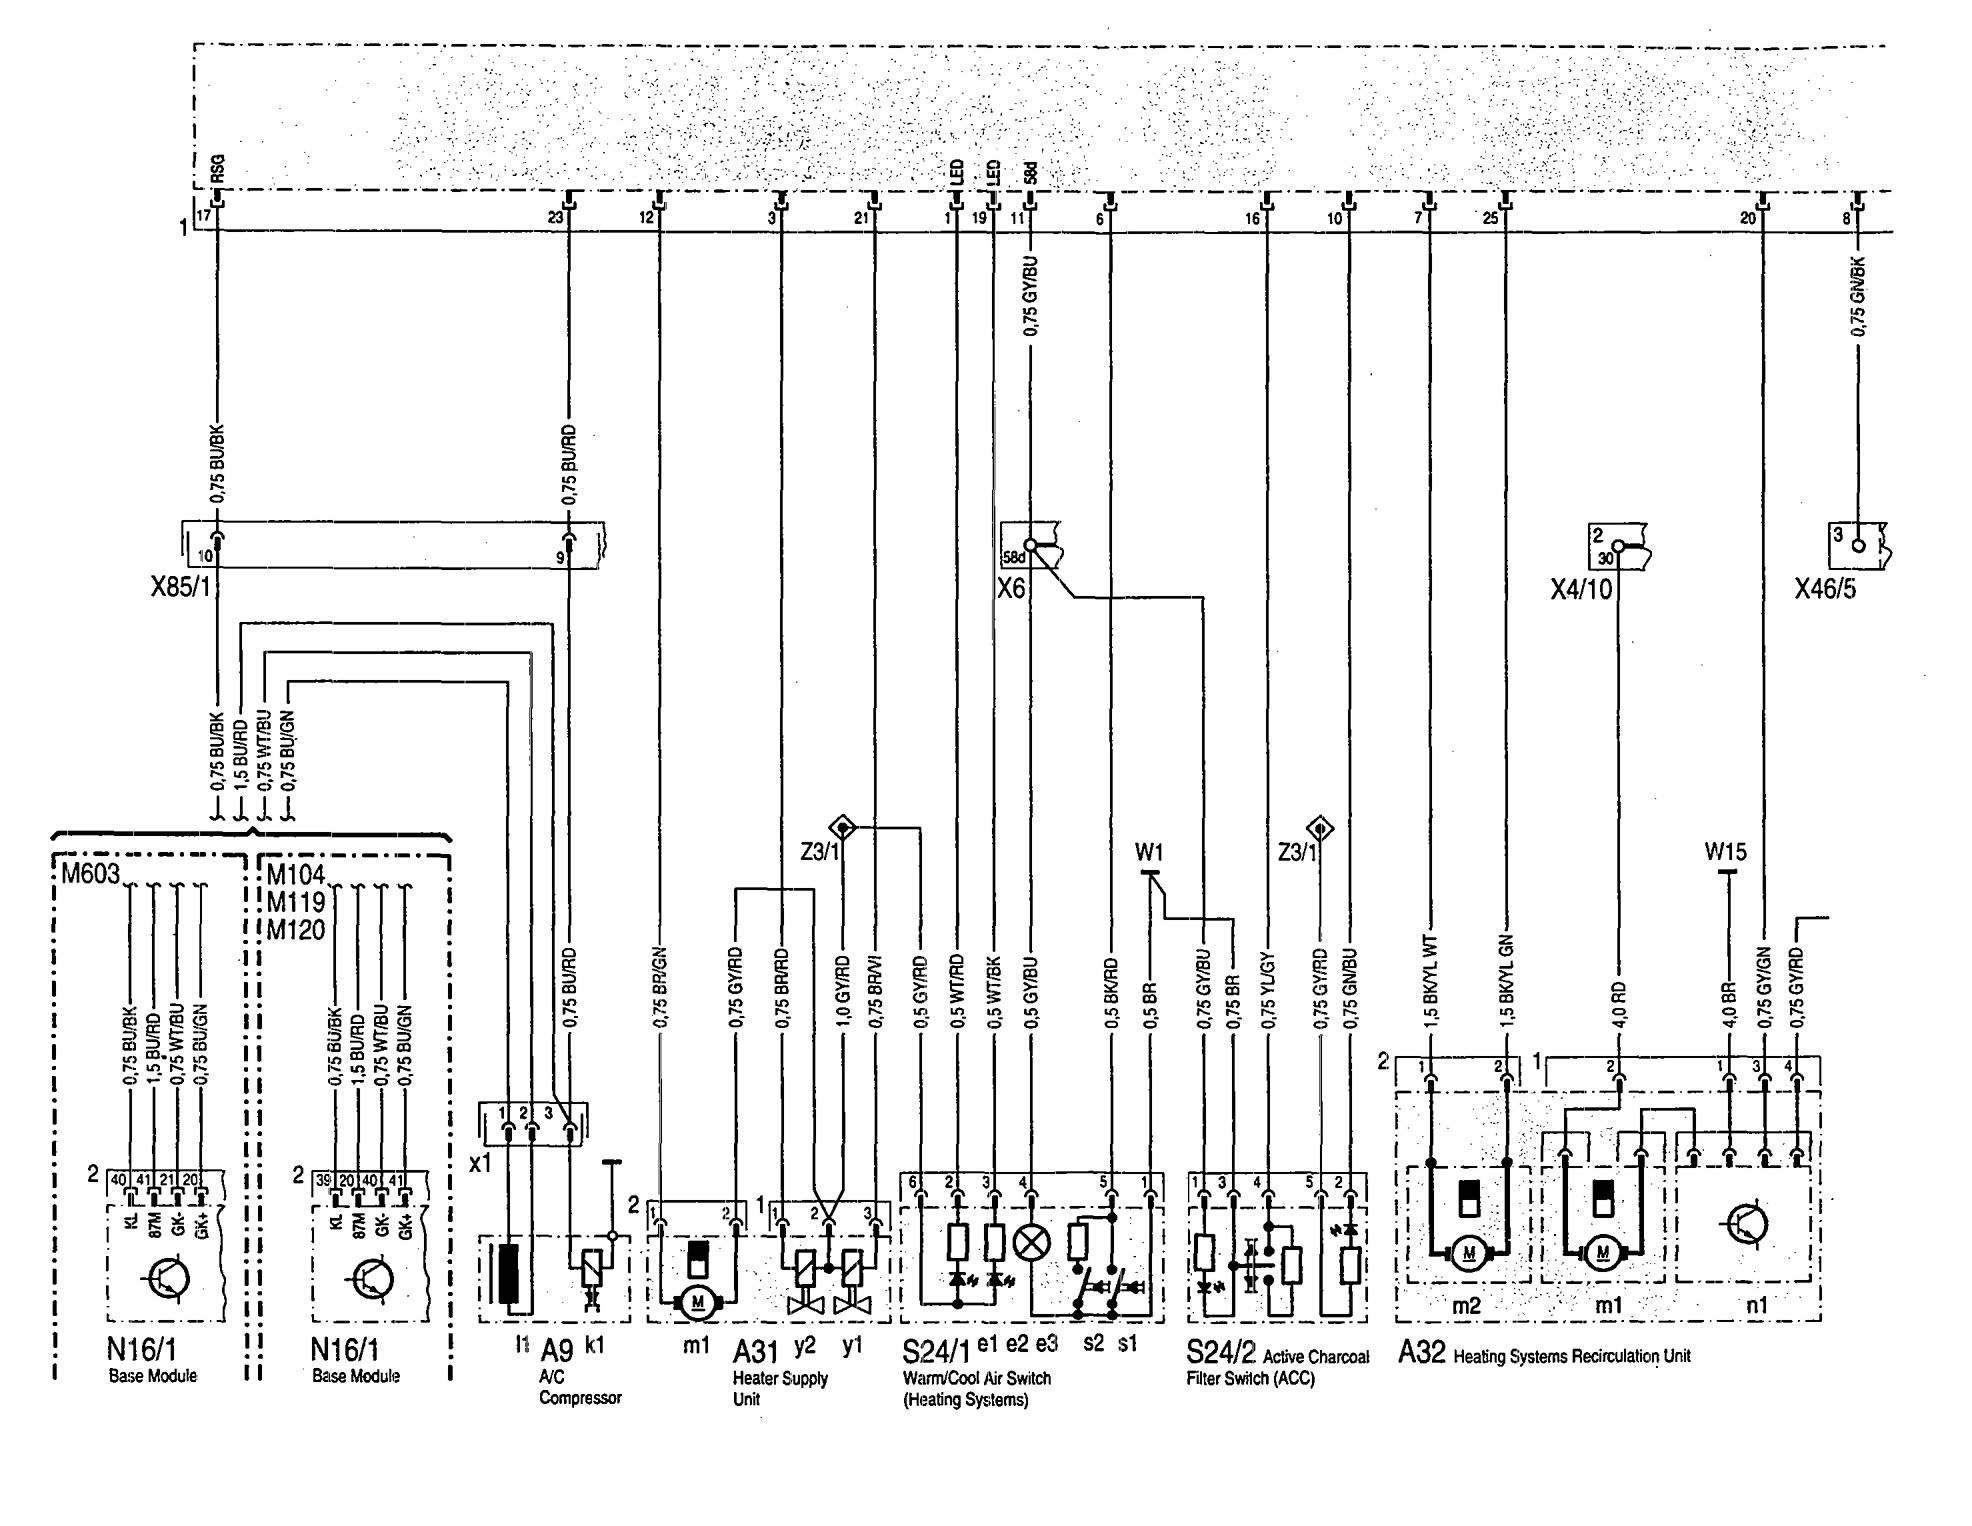 Hvac Control Wiring Diagram Library Diagrams Systems Mercedes Benz 300se Controls Part 1